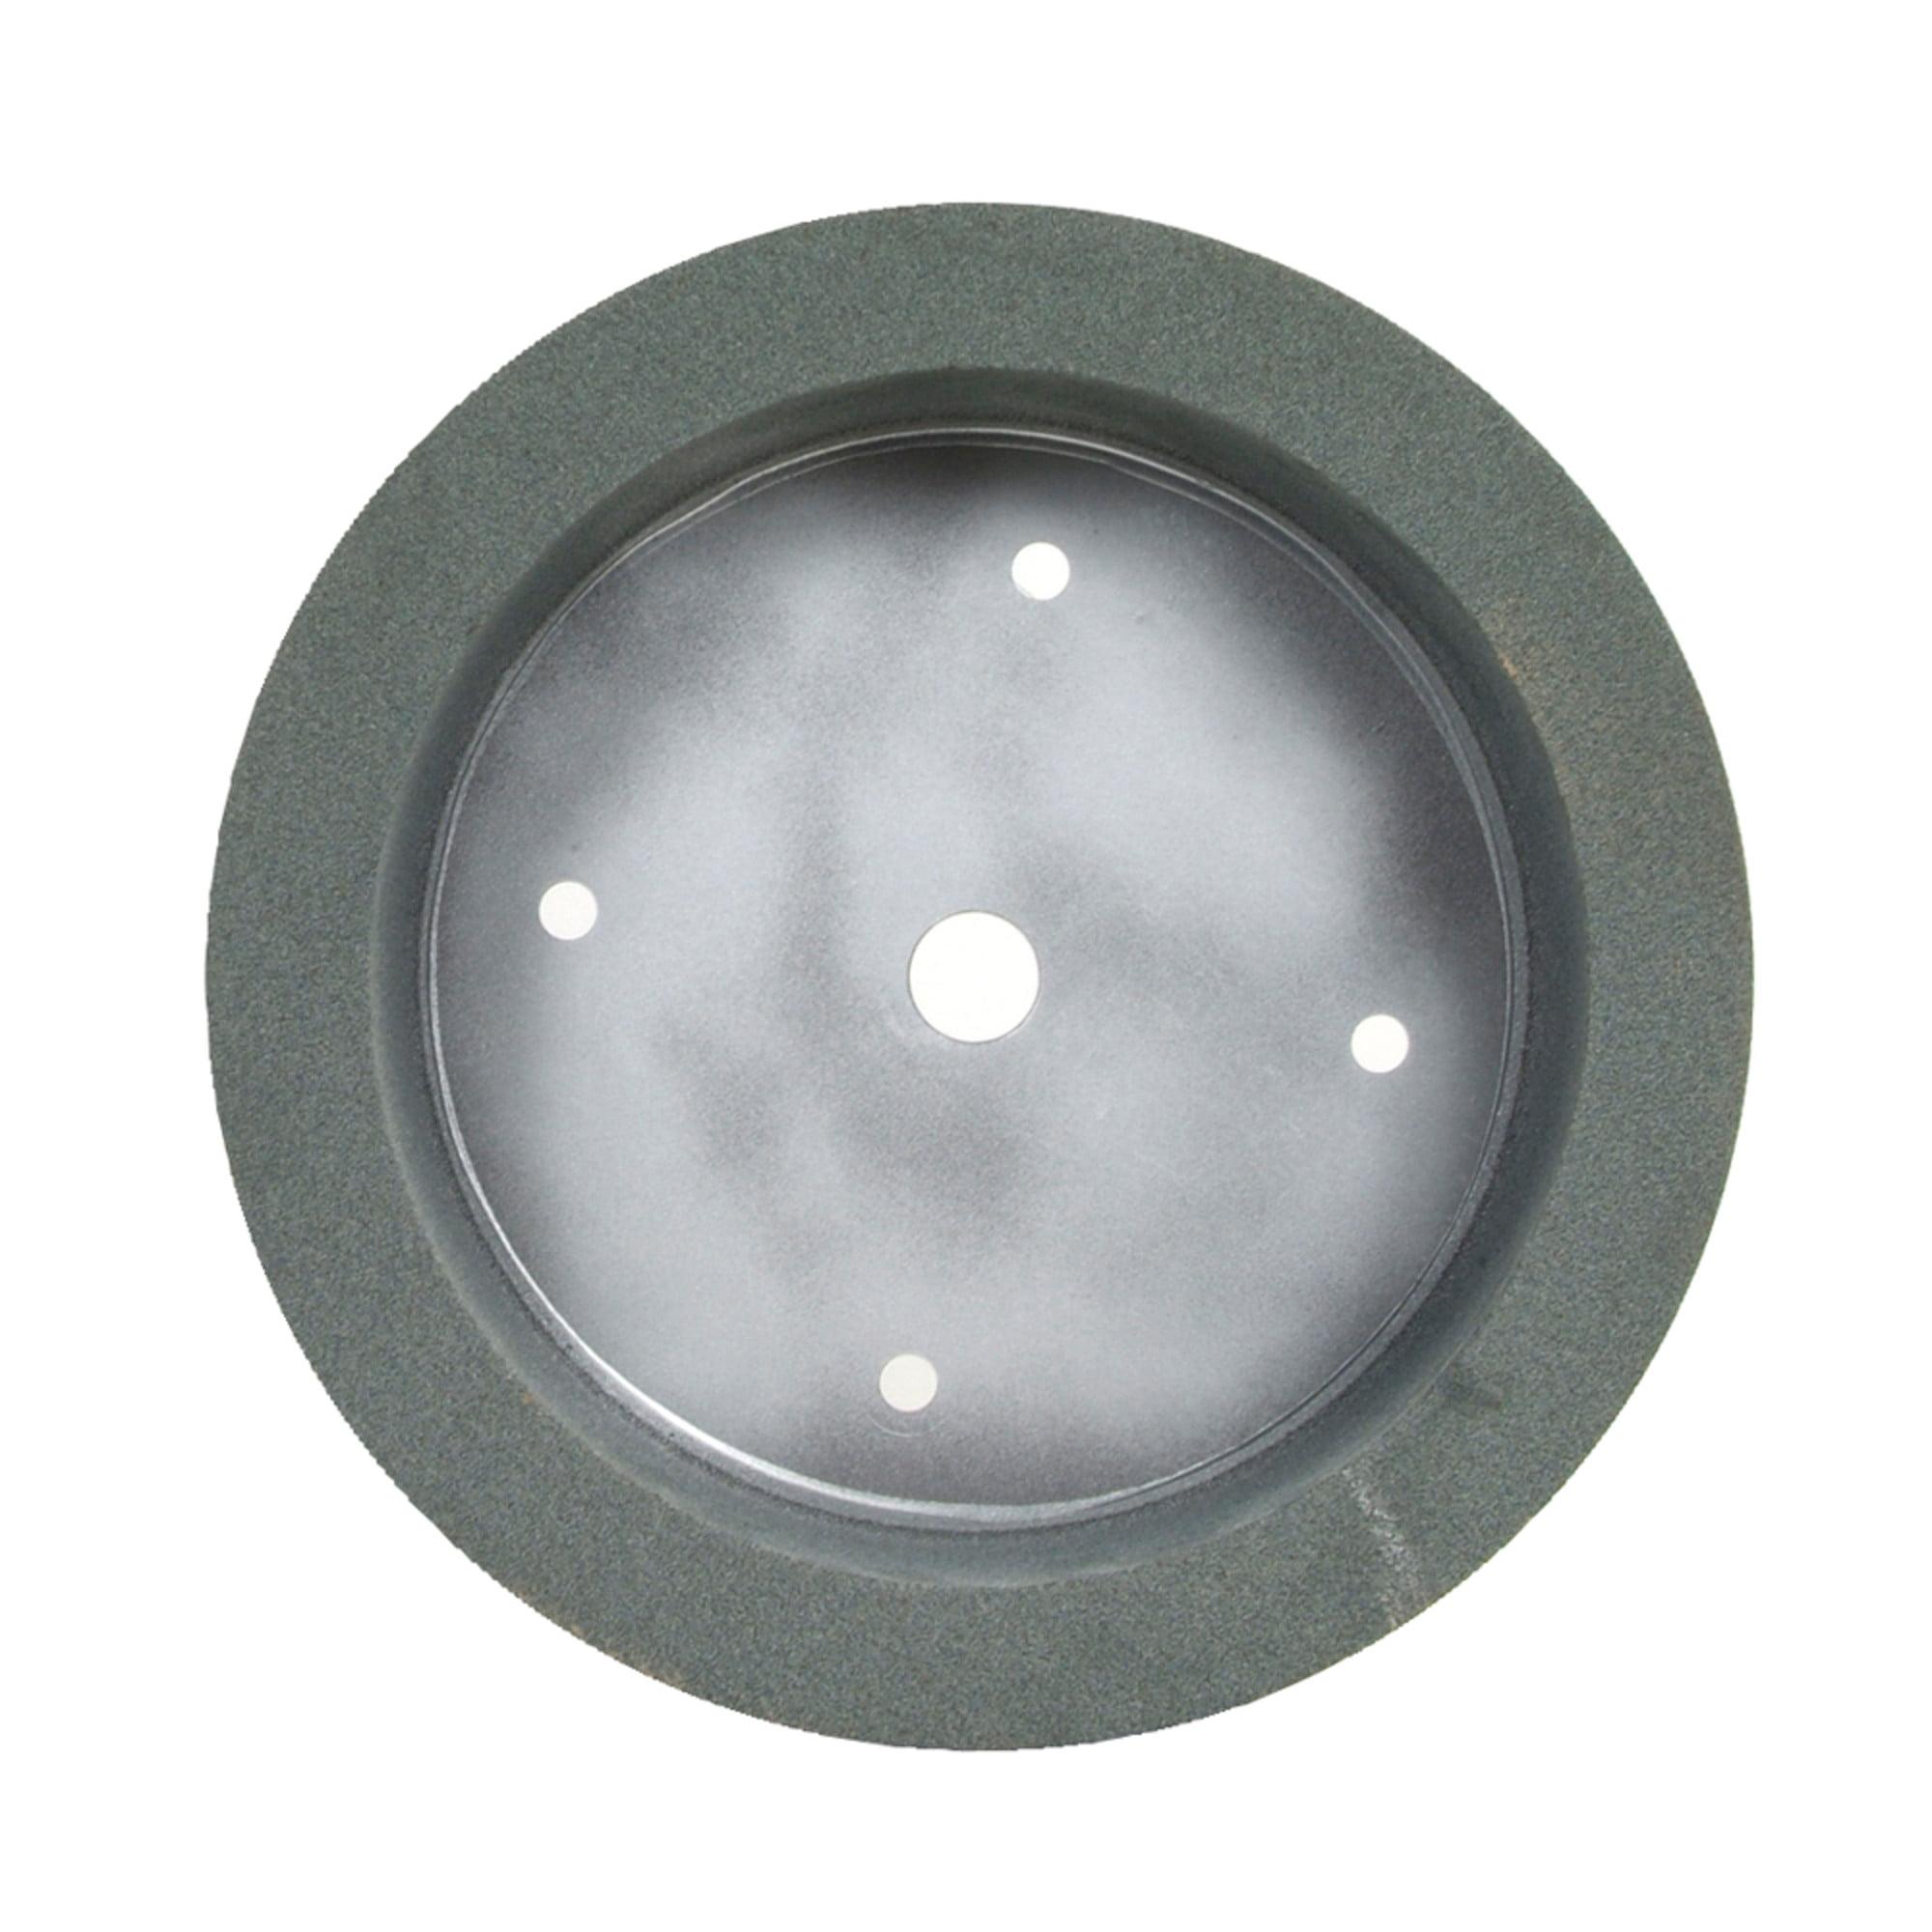 Norton 66253364657 Surface Grinding Wheels Size 14 x 4 x 11